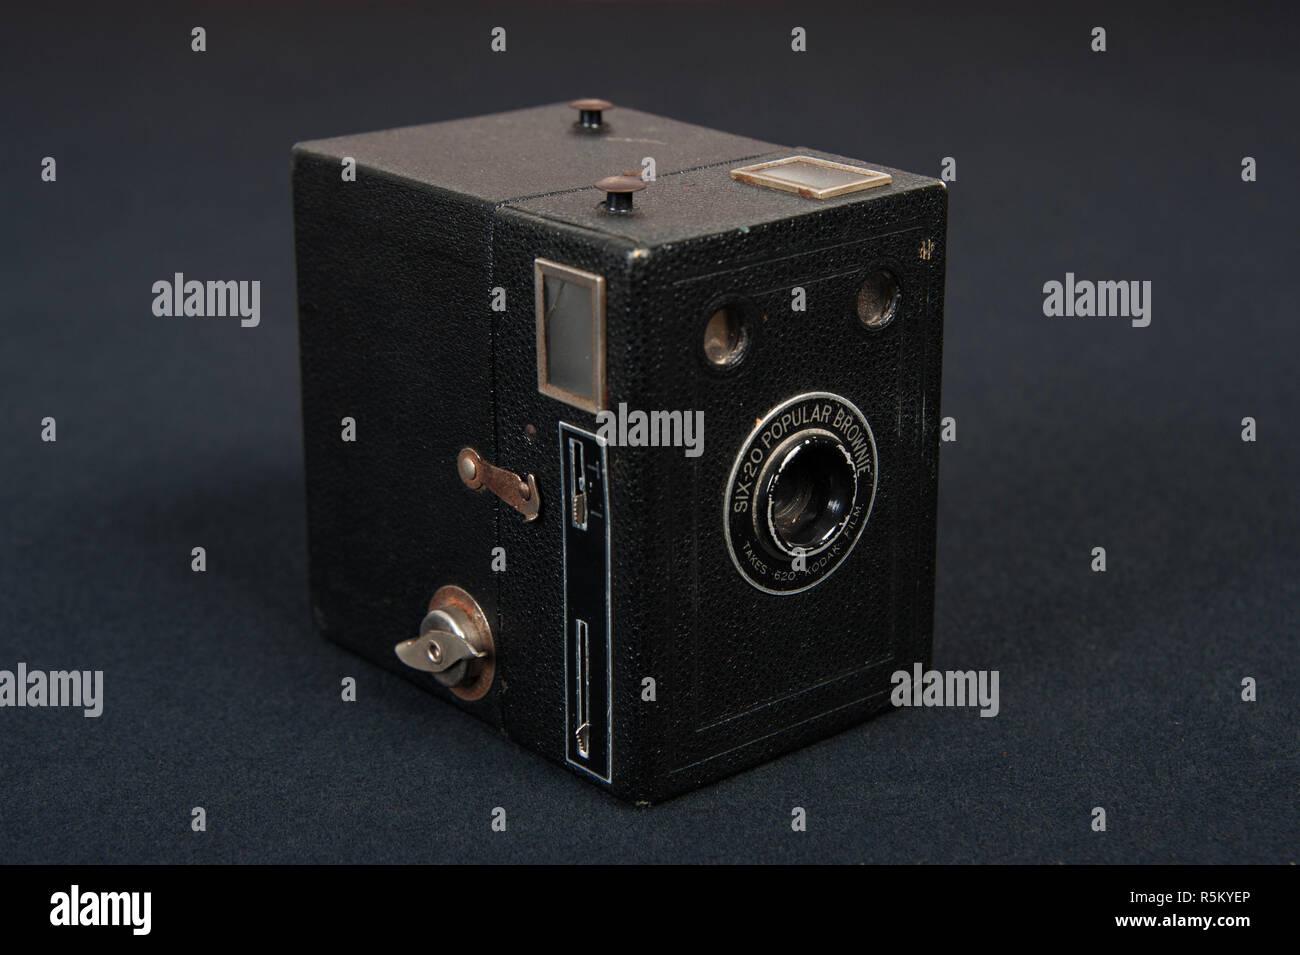 Kodak lentilles datant